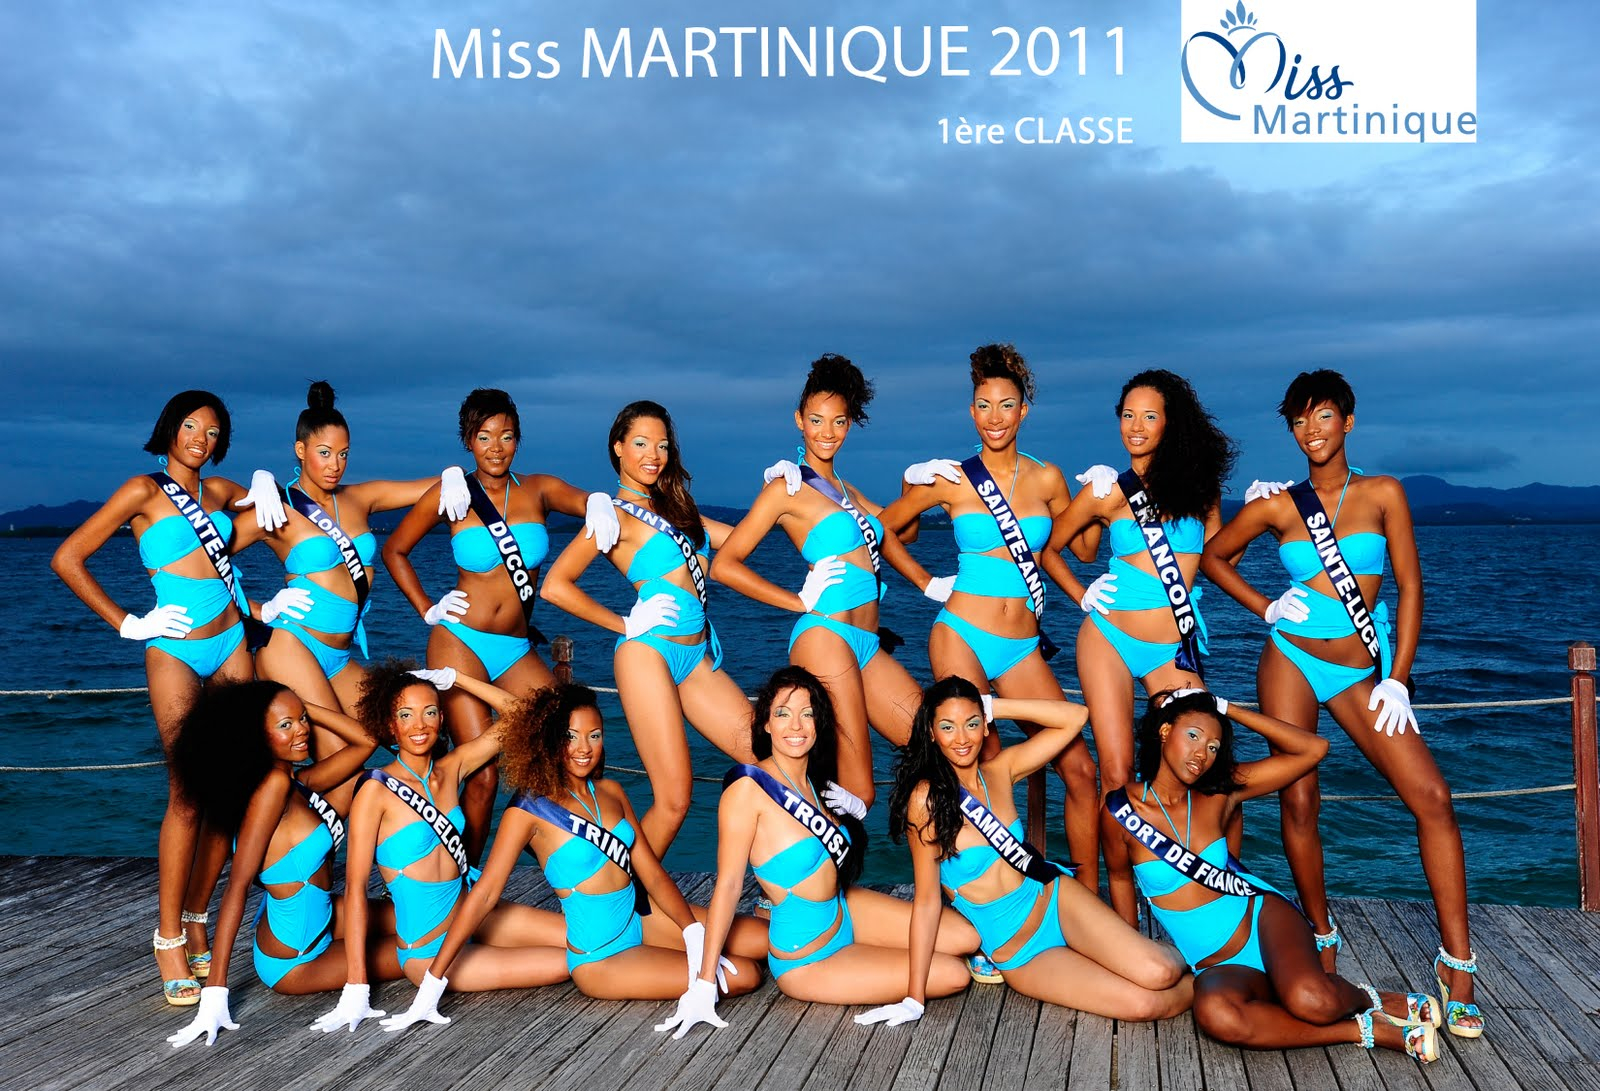 http://4.bp.blogspot.com/_XNjfnkzZrrE/TEEOeSnrk_I/AAAAAAAACEk/f9Kz5vqFIjw/s1600/Miss+Martinique+2011.jpg